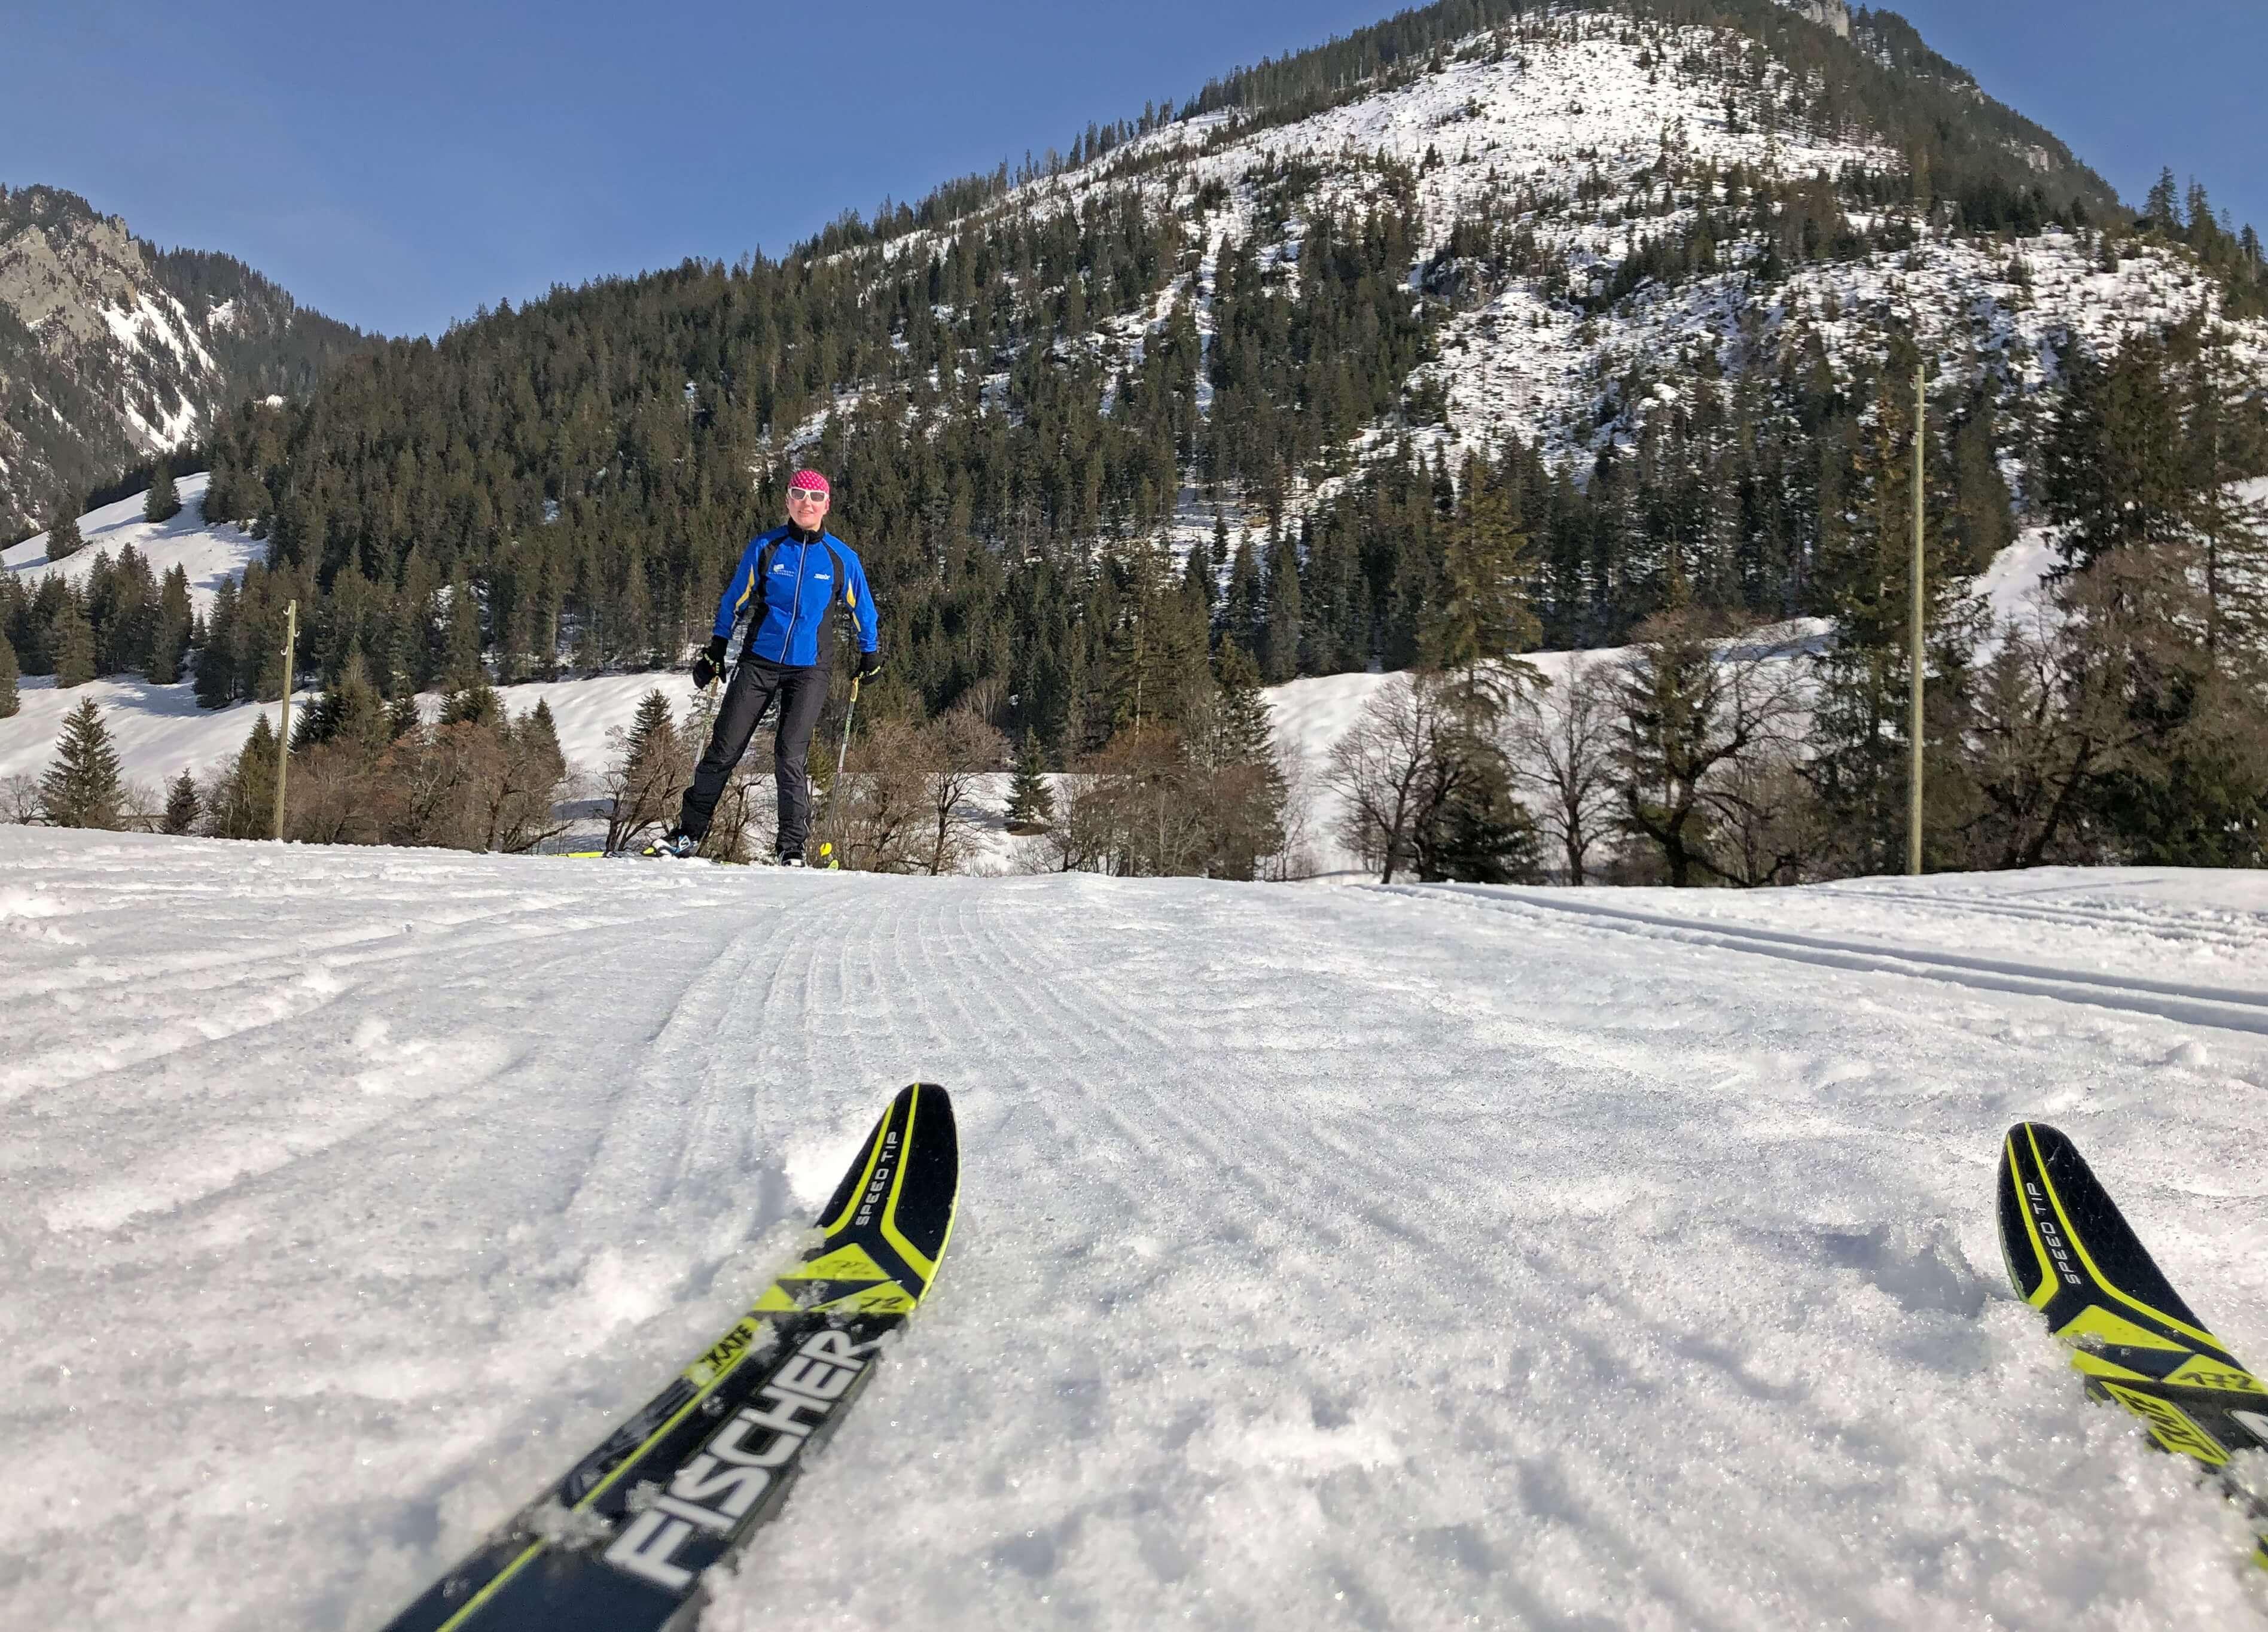 Skatingvergnügen im Naturpark Diemtigtal